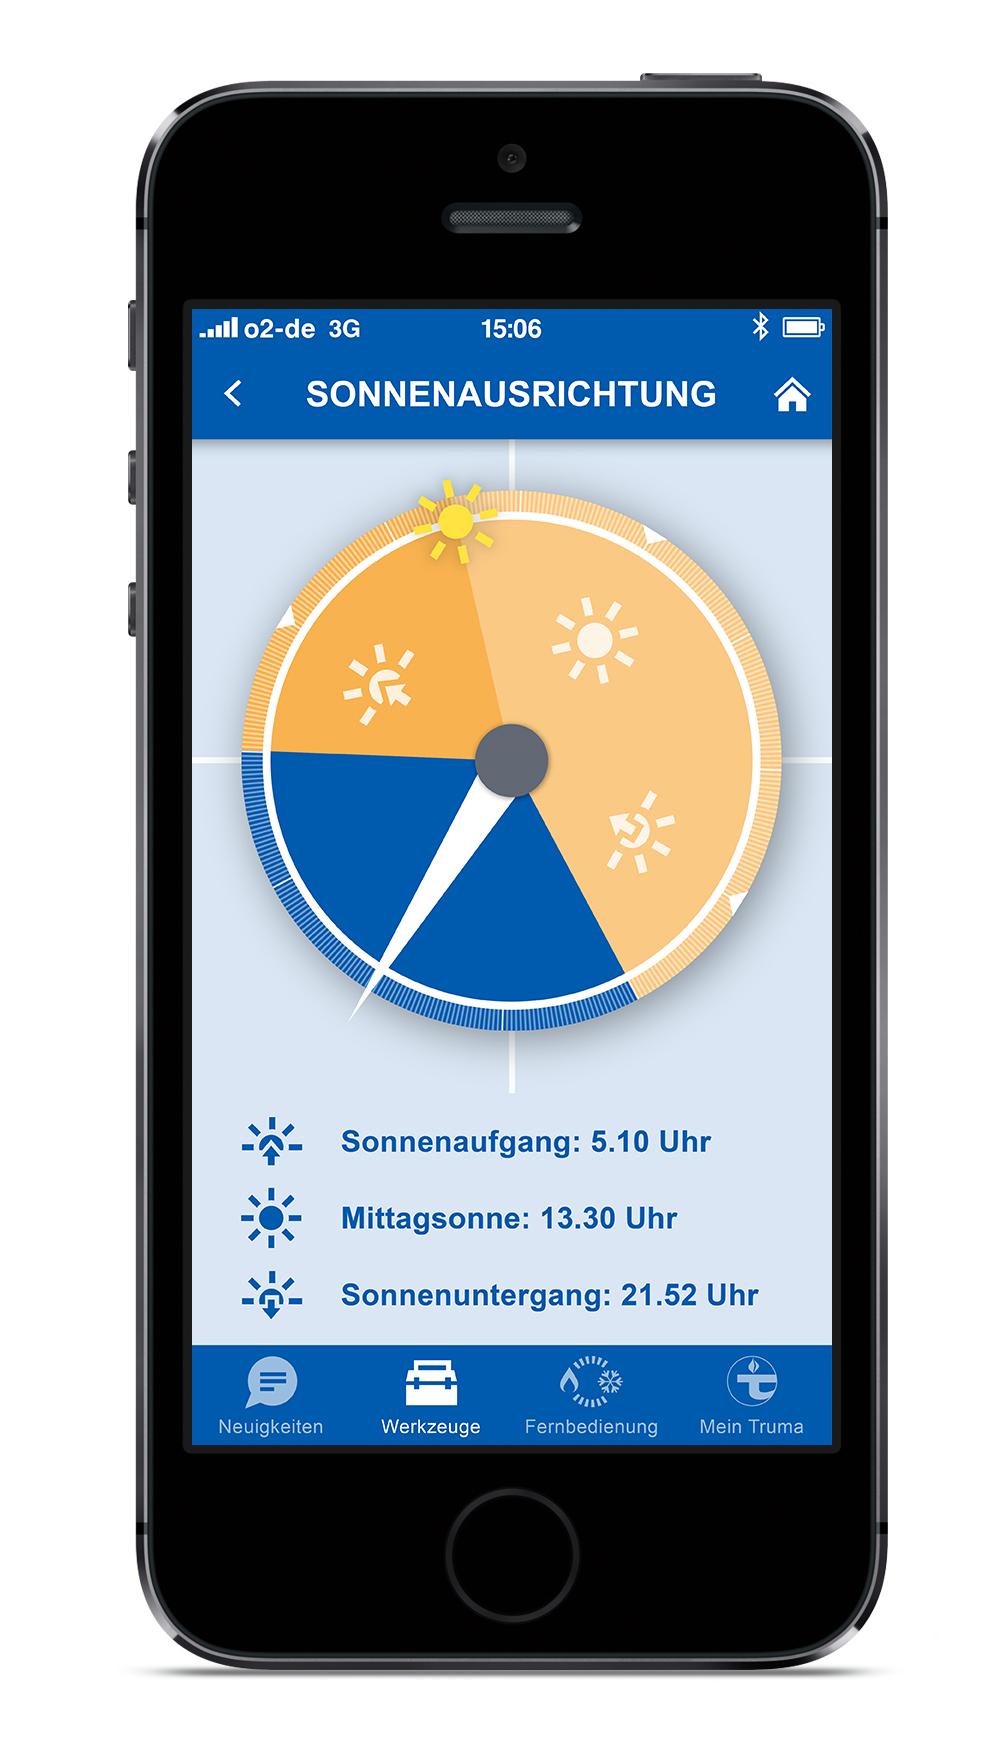 Truma_App_Sonnenausrichtung